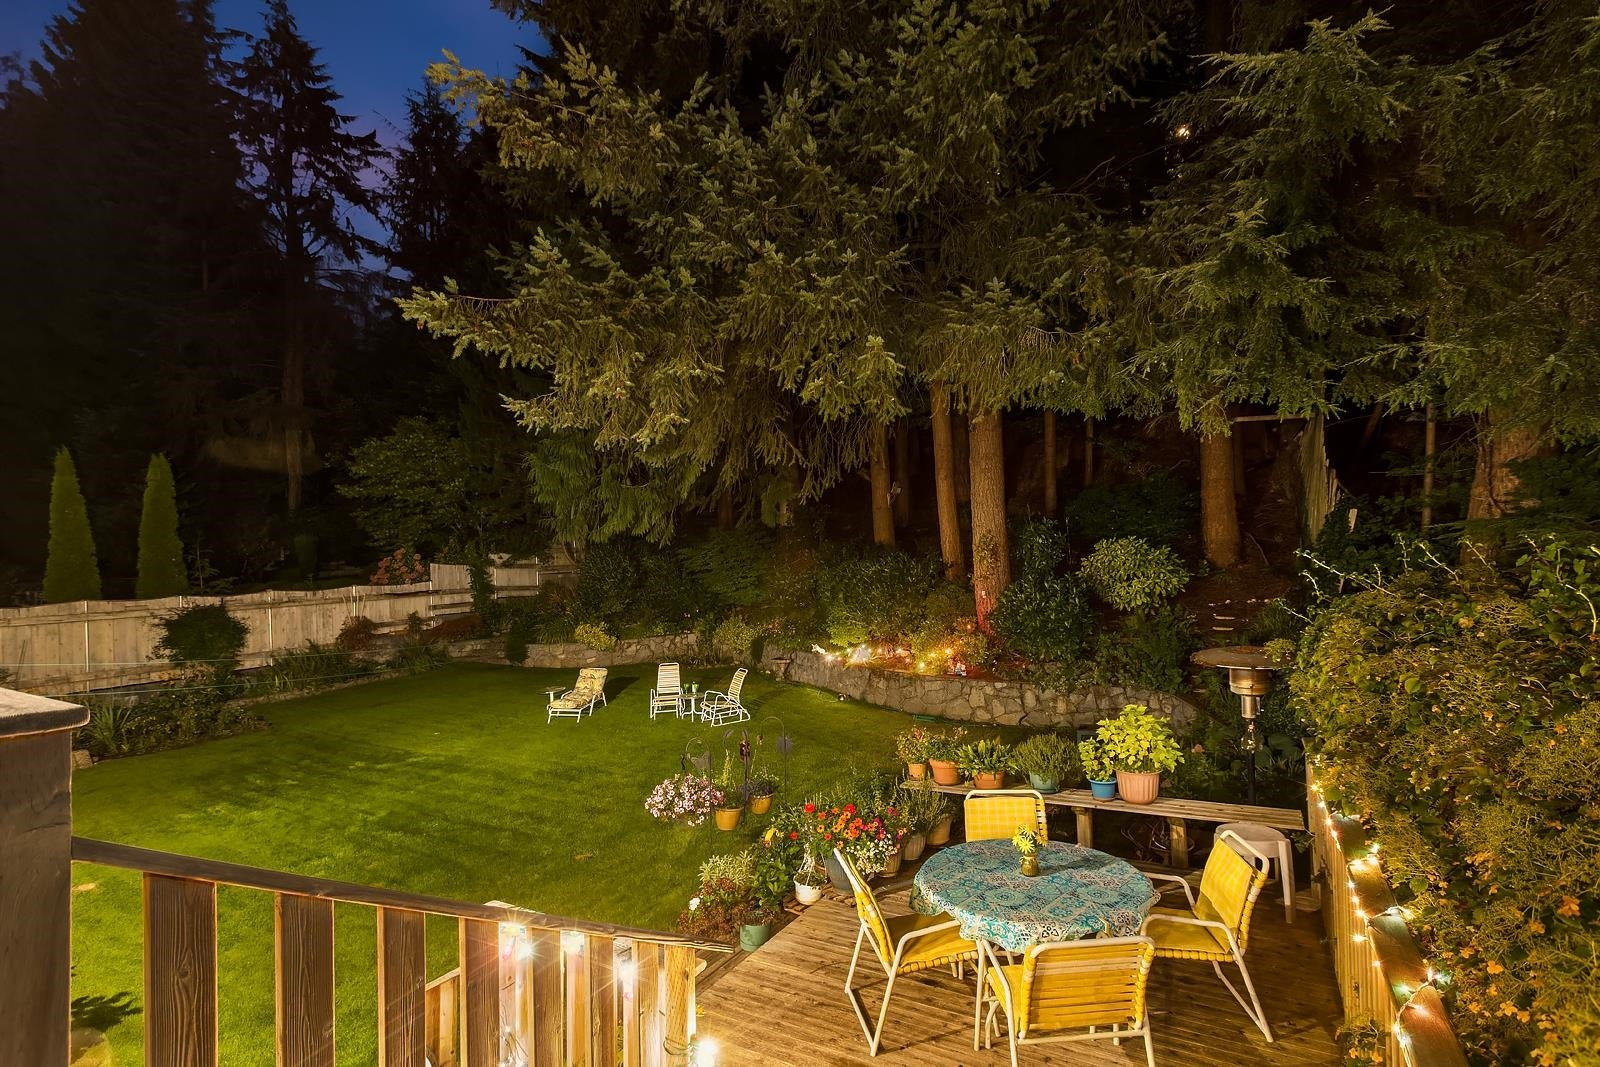 3495 WELLINGTON CRESCENT - Edgemont House/Single Family for sale, 3 Bedrooms (R2617949) - #15